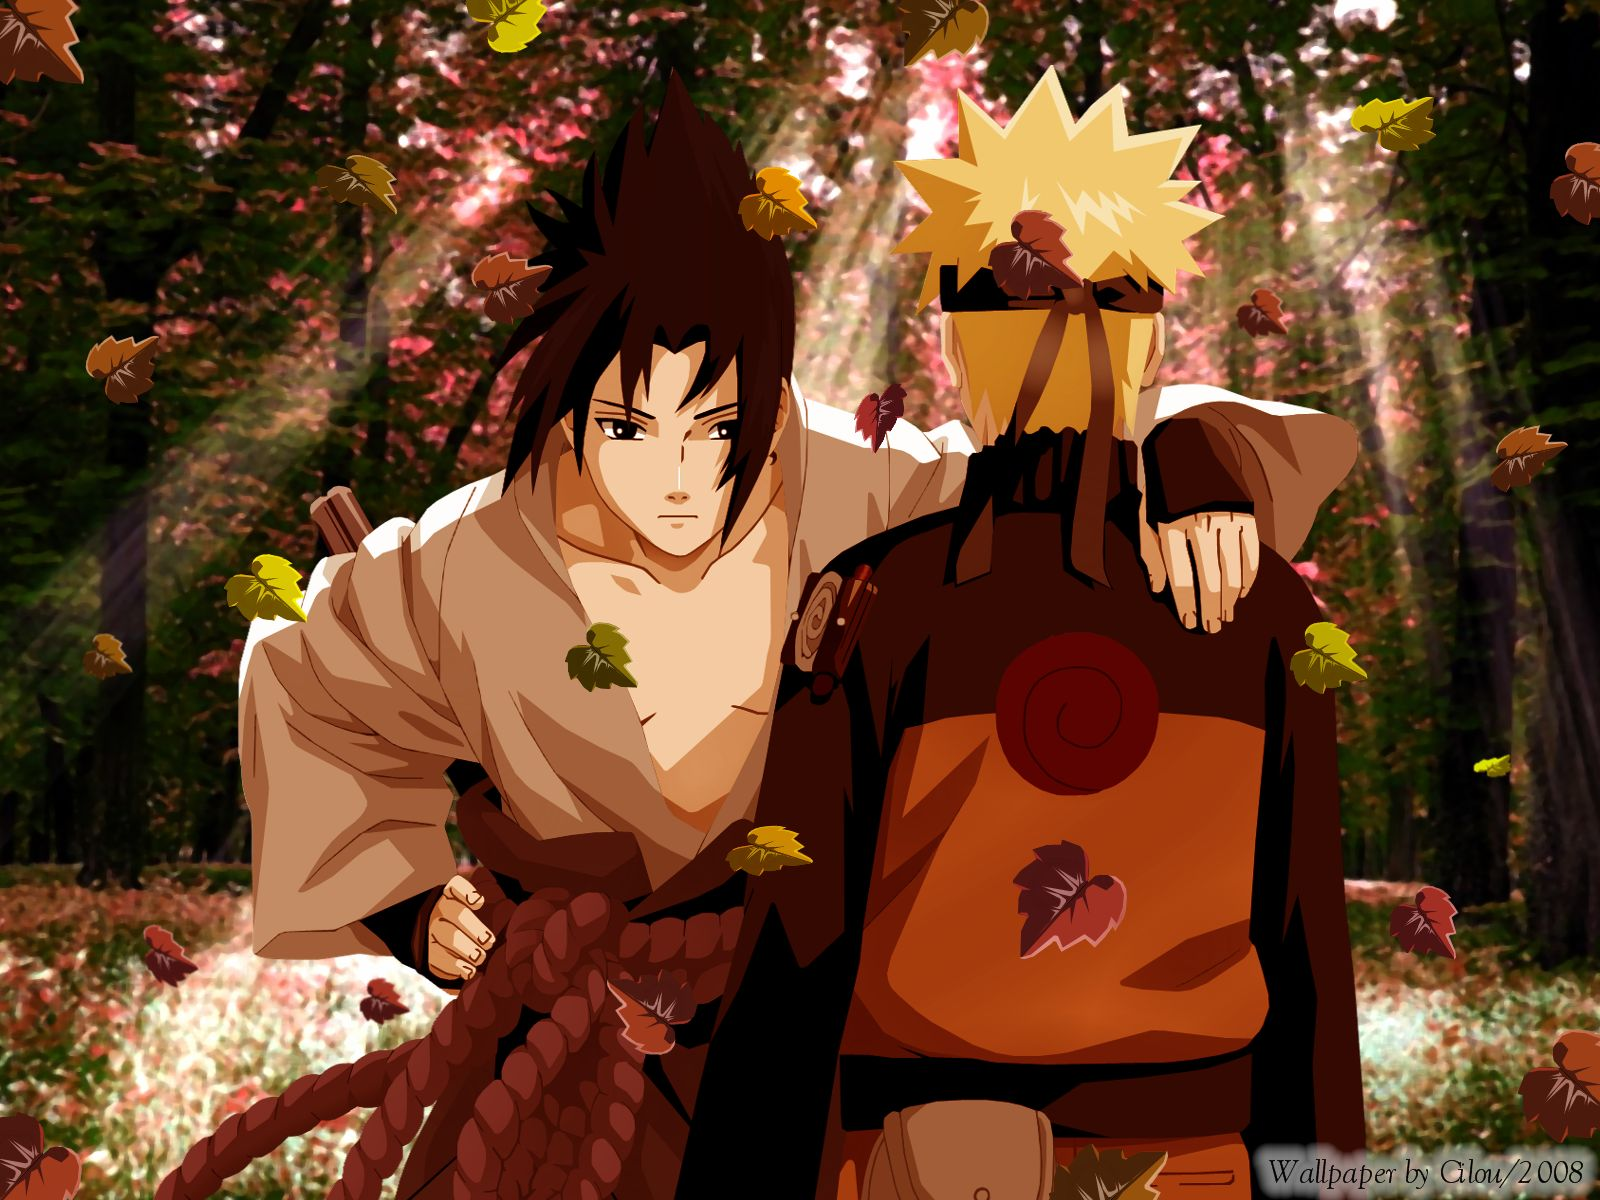 Wallpapers Naruto Shippuden HD